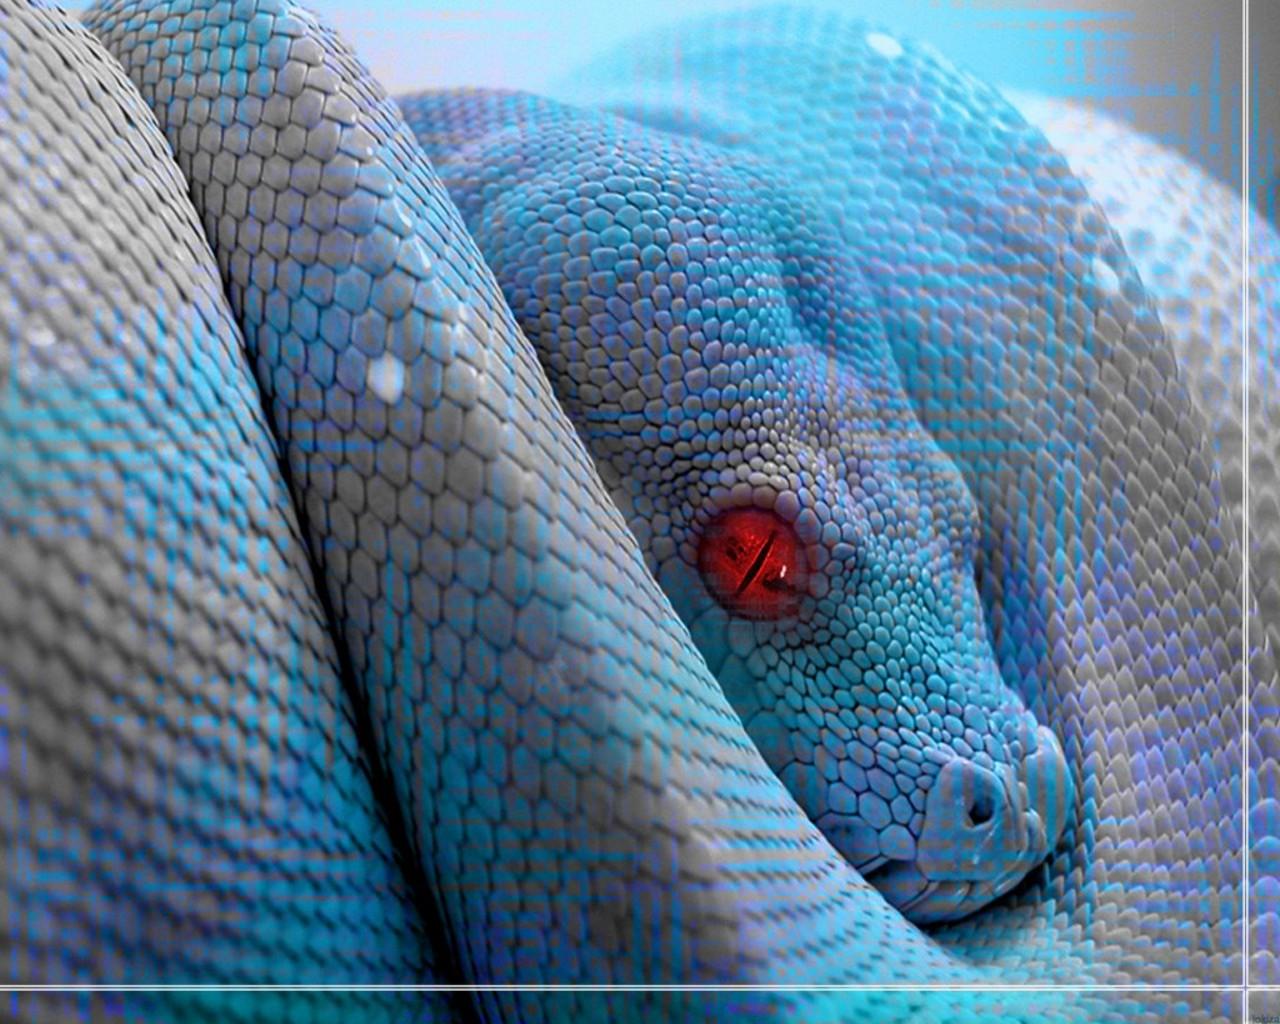 A 2 Z Reptiles Reptiles hd wal...